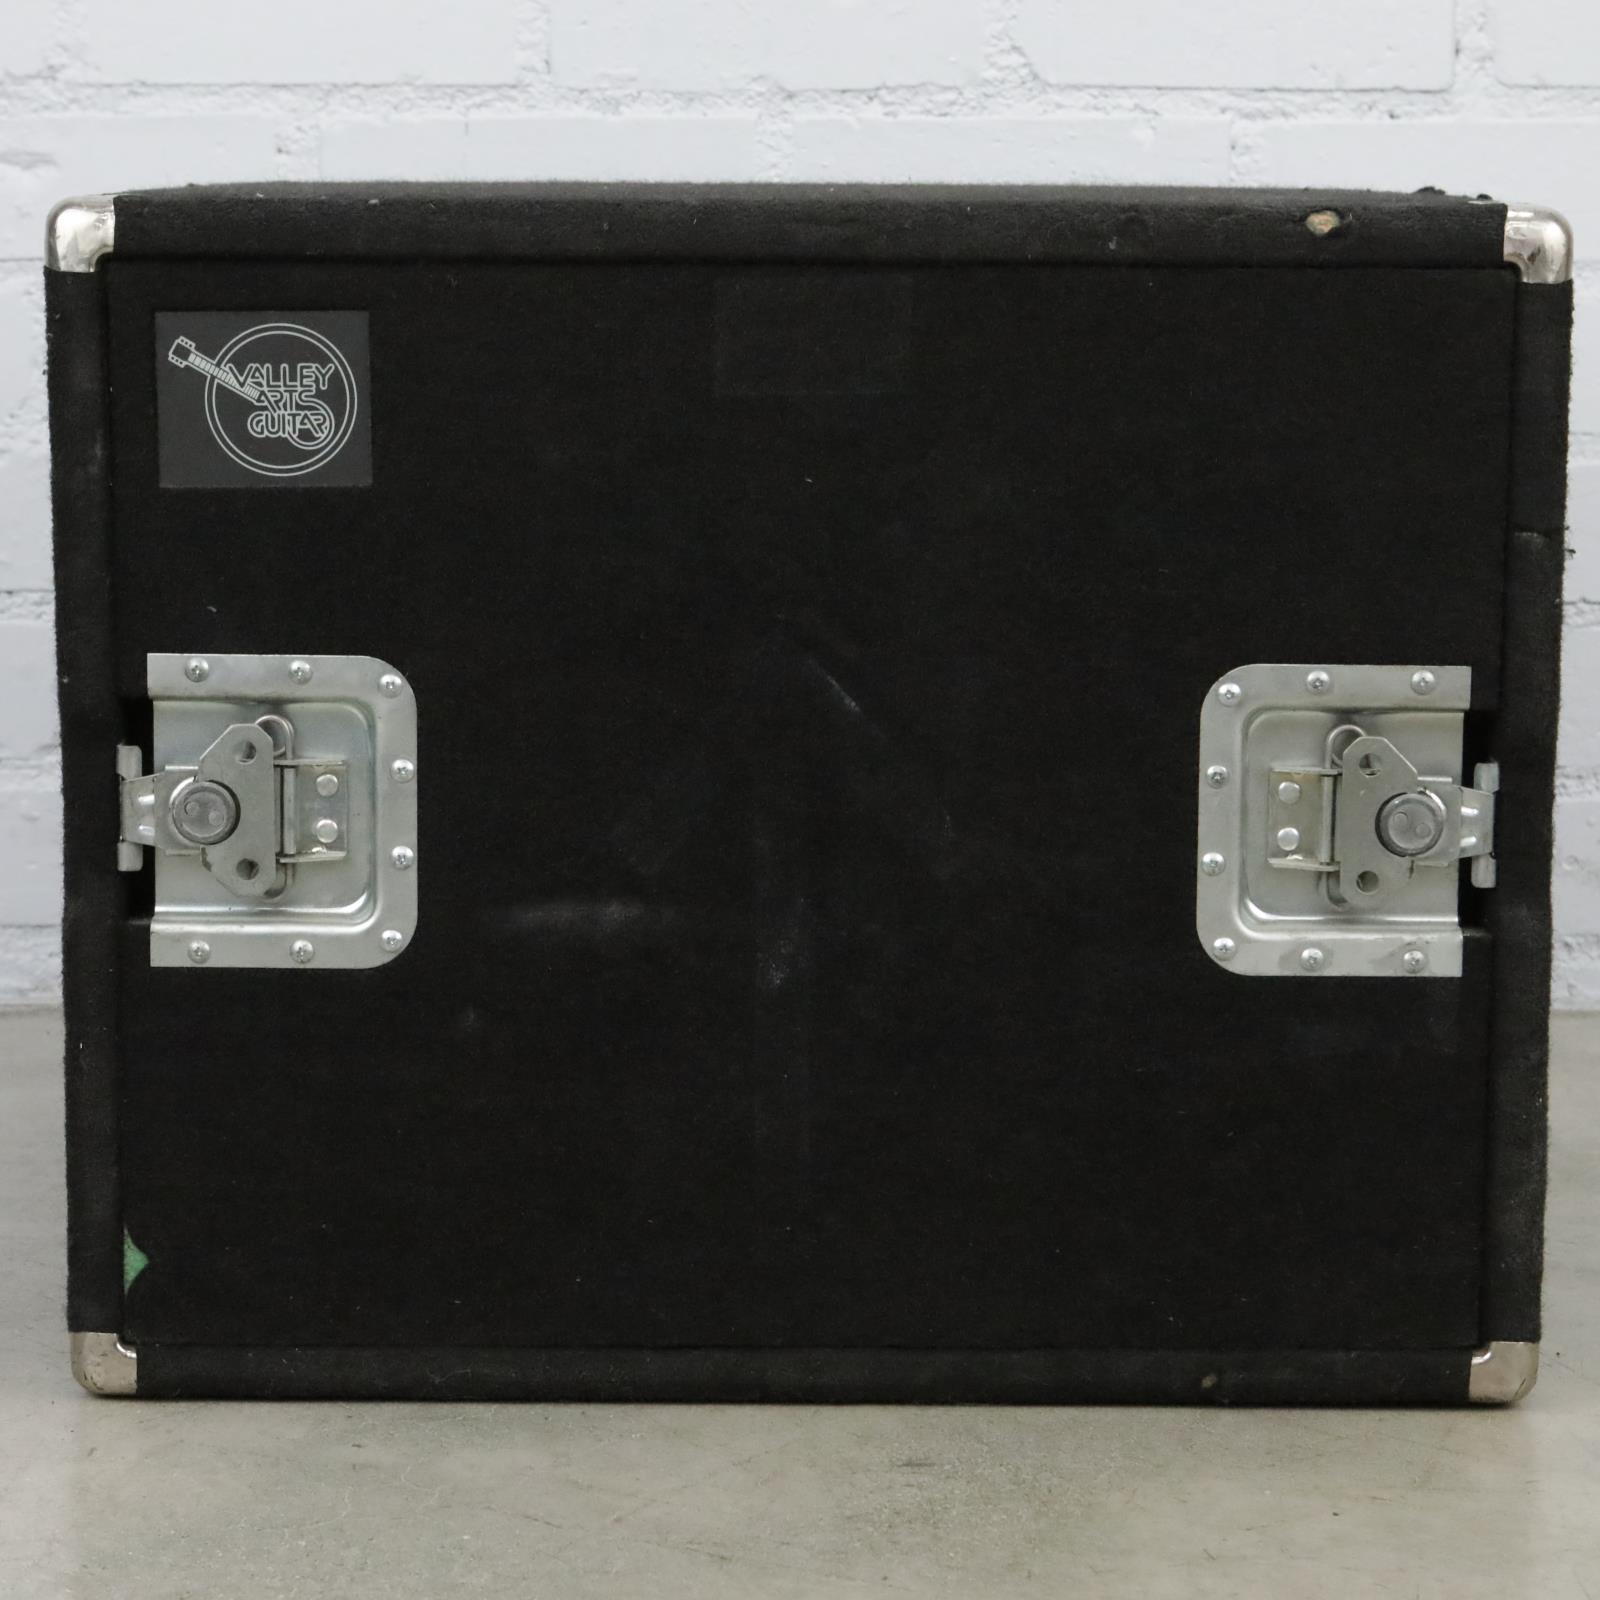 Valley Arts Guitar 8U 8 Space Shock Rack Carpeted Road Case w/ Drawer #40425